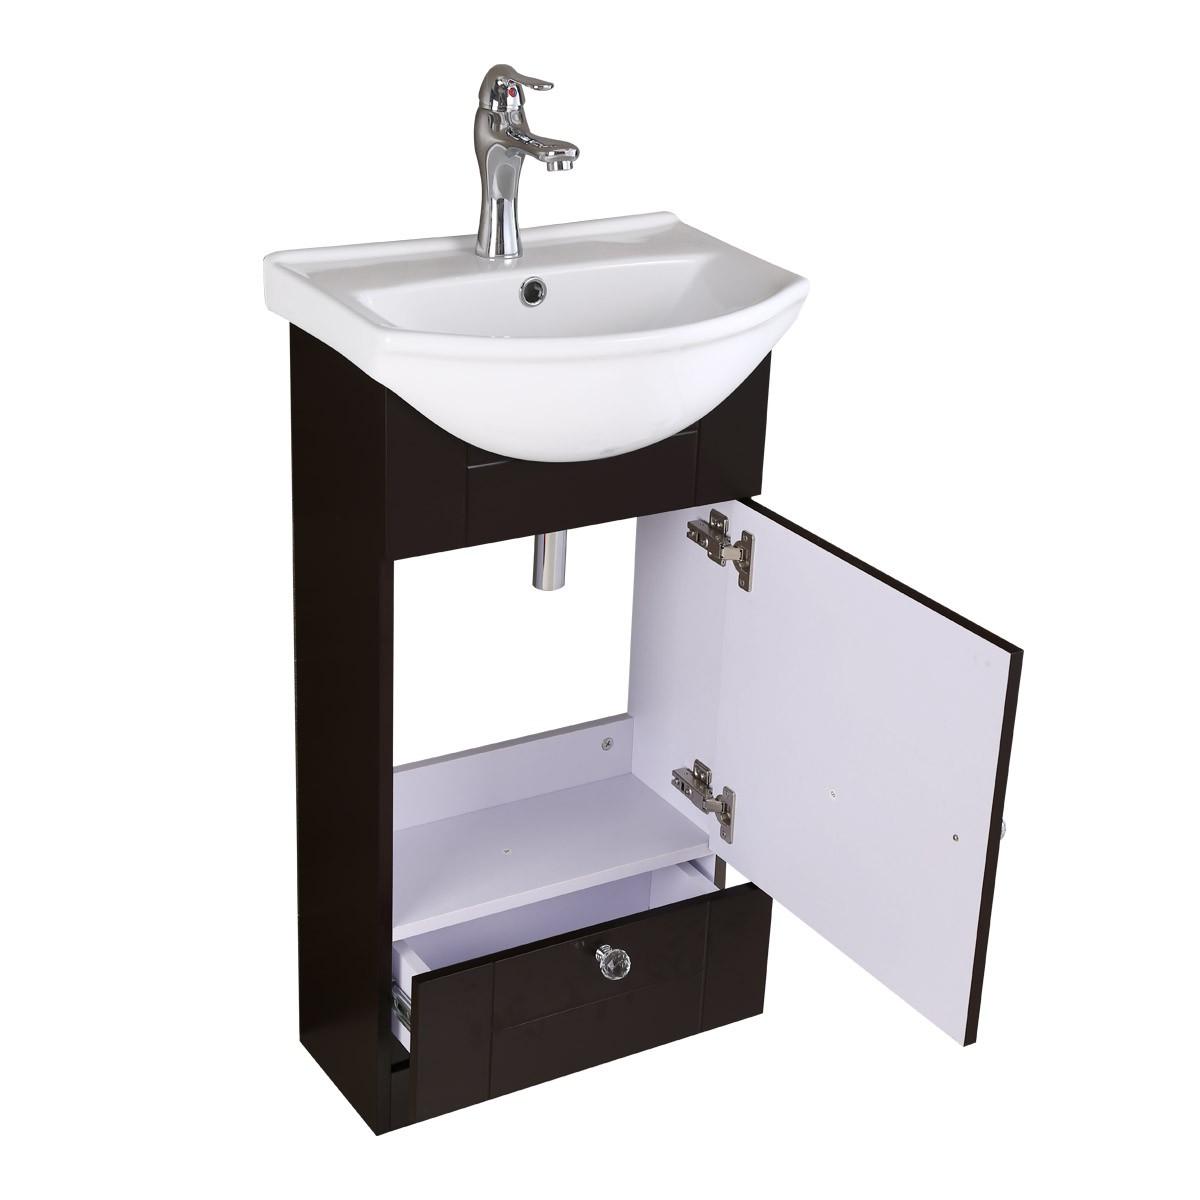 Single bathroom vanity cabinet sink wall mount black - Small bathroom sink cabinet ...